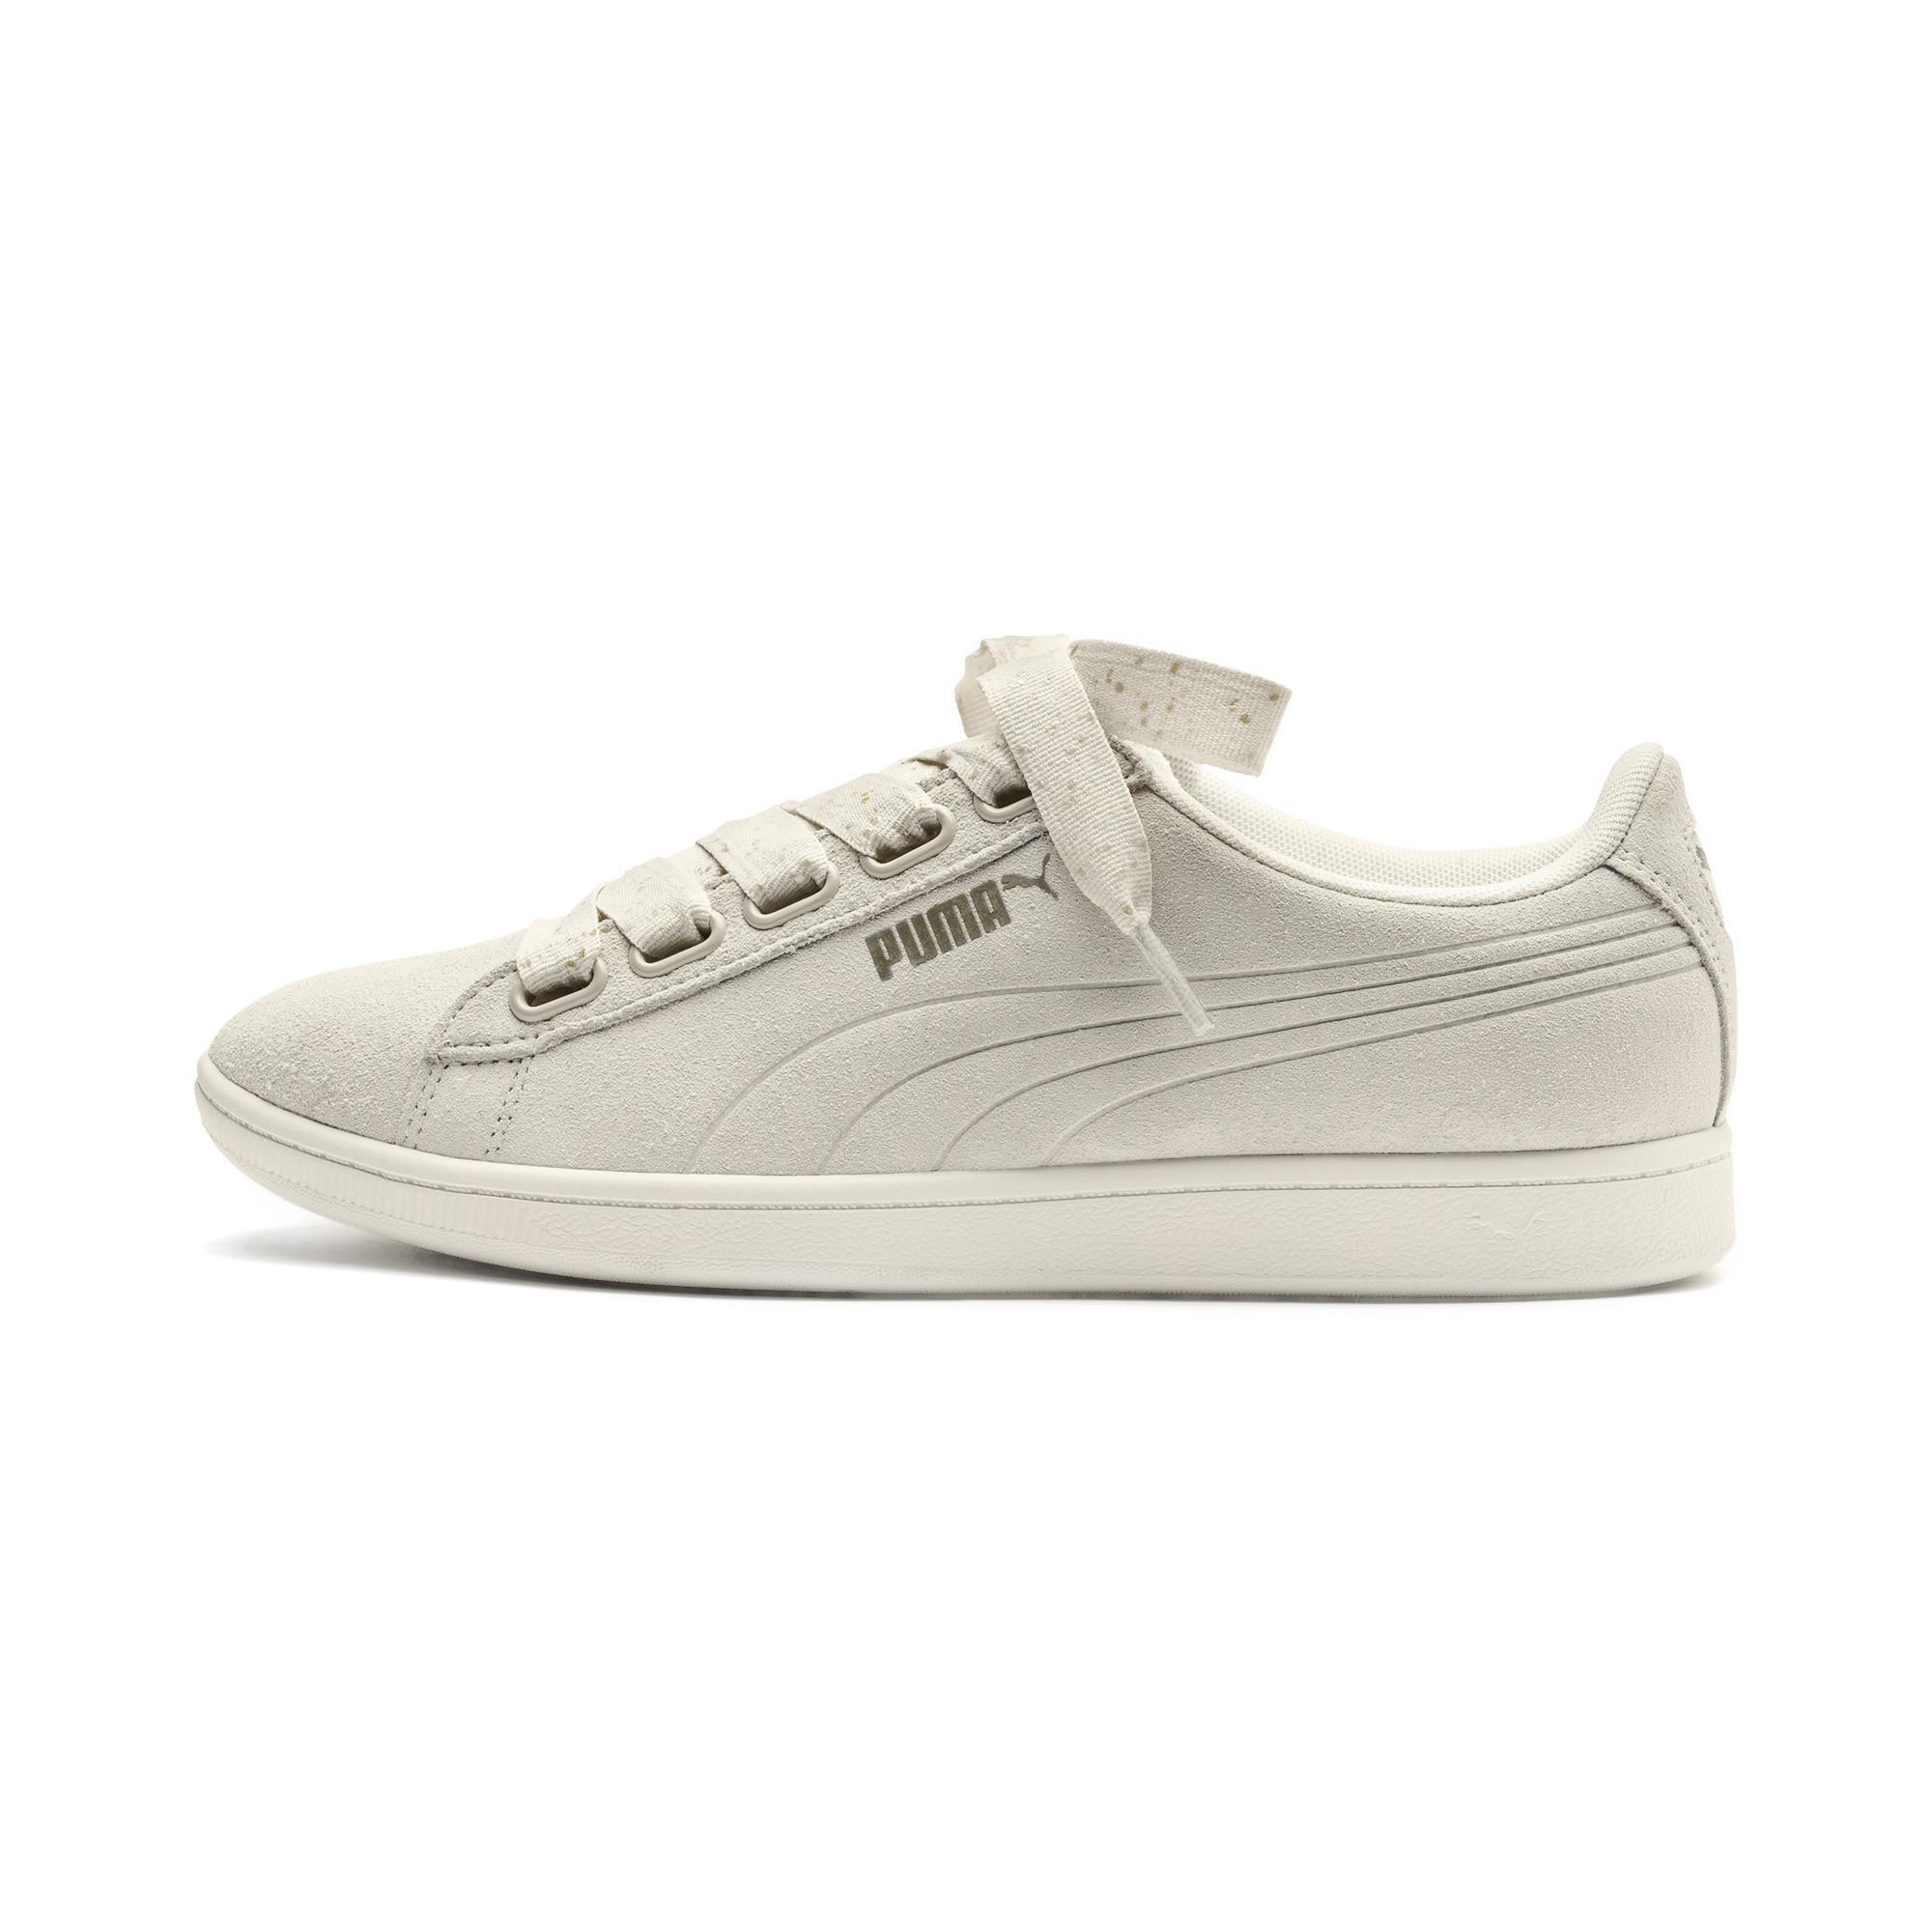 Lyst - PUMA Vikky Ribbon Dots Sneakers in White 4286bb56b